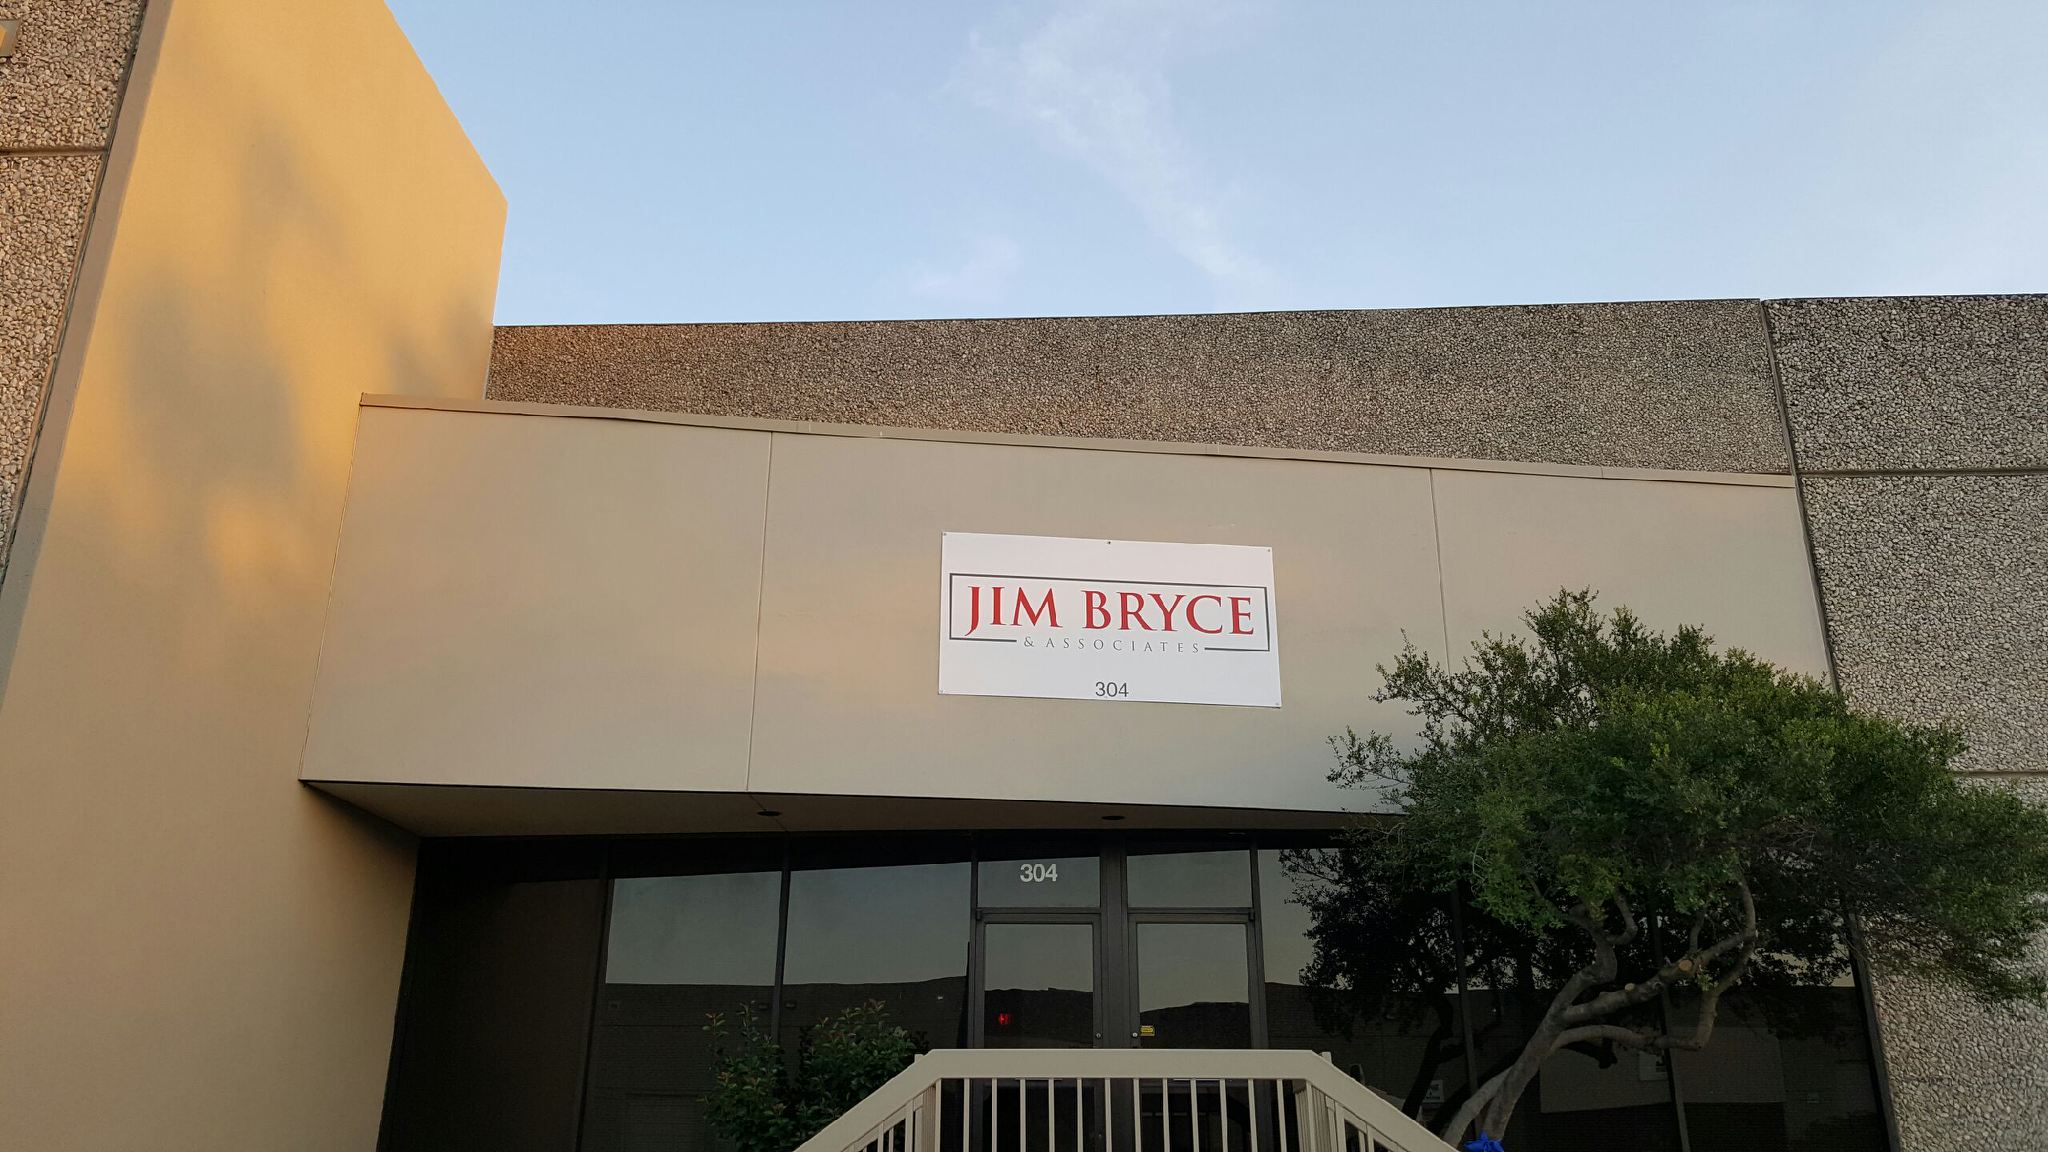 exterior building panel sign in Dallas TX